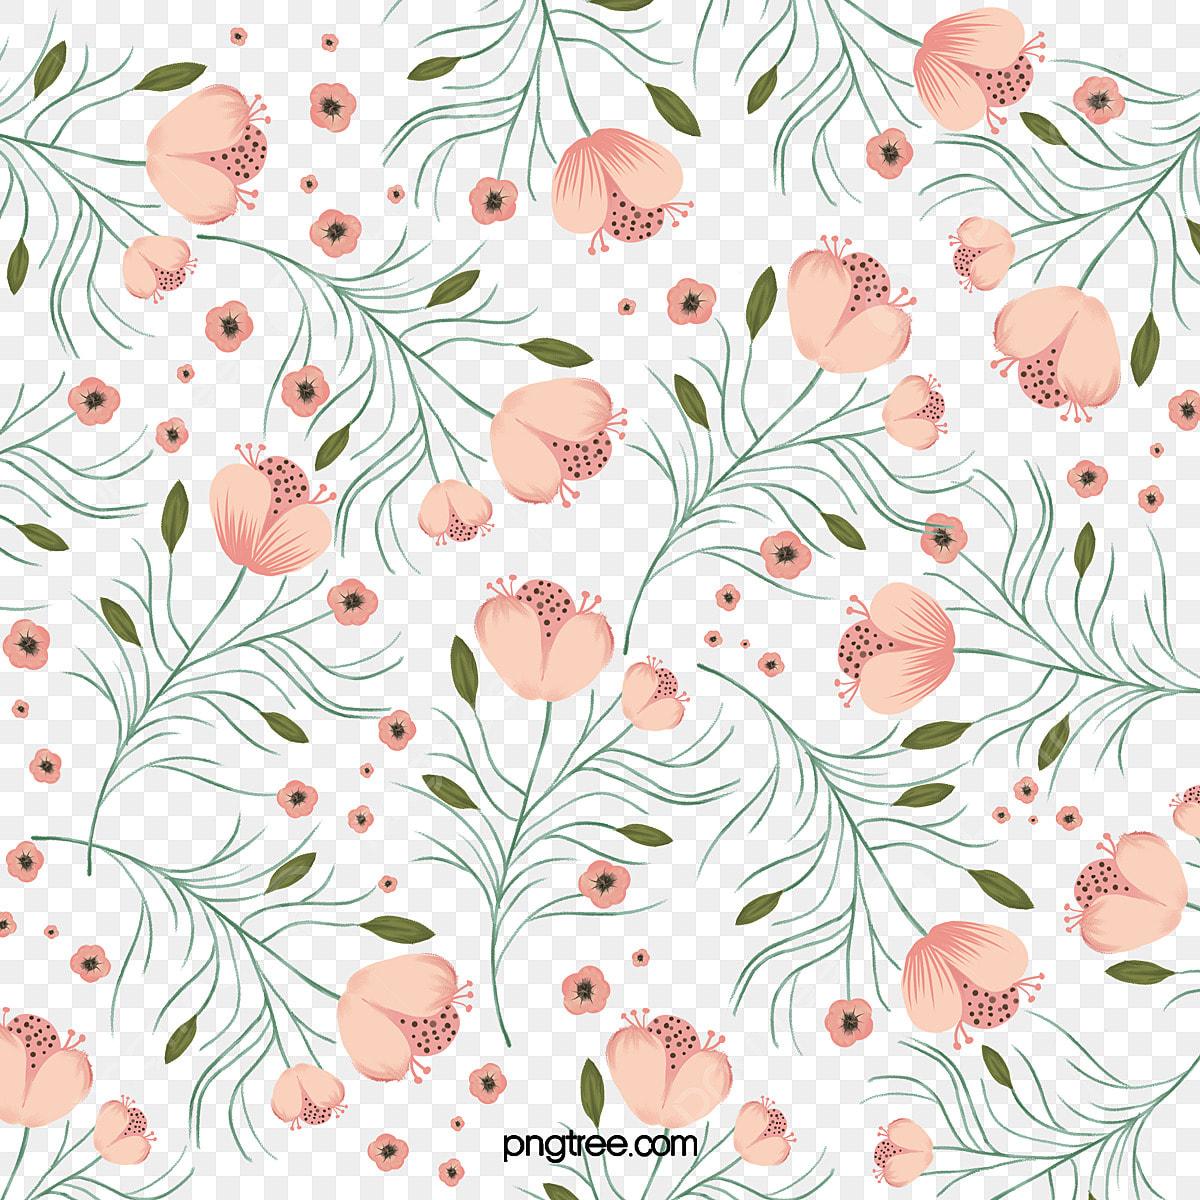 Flower Print Flower Clipart Hand Painted Flower Print Pink